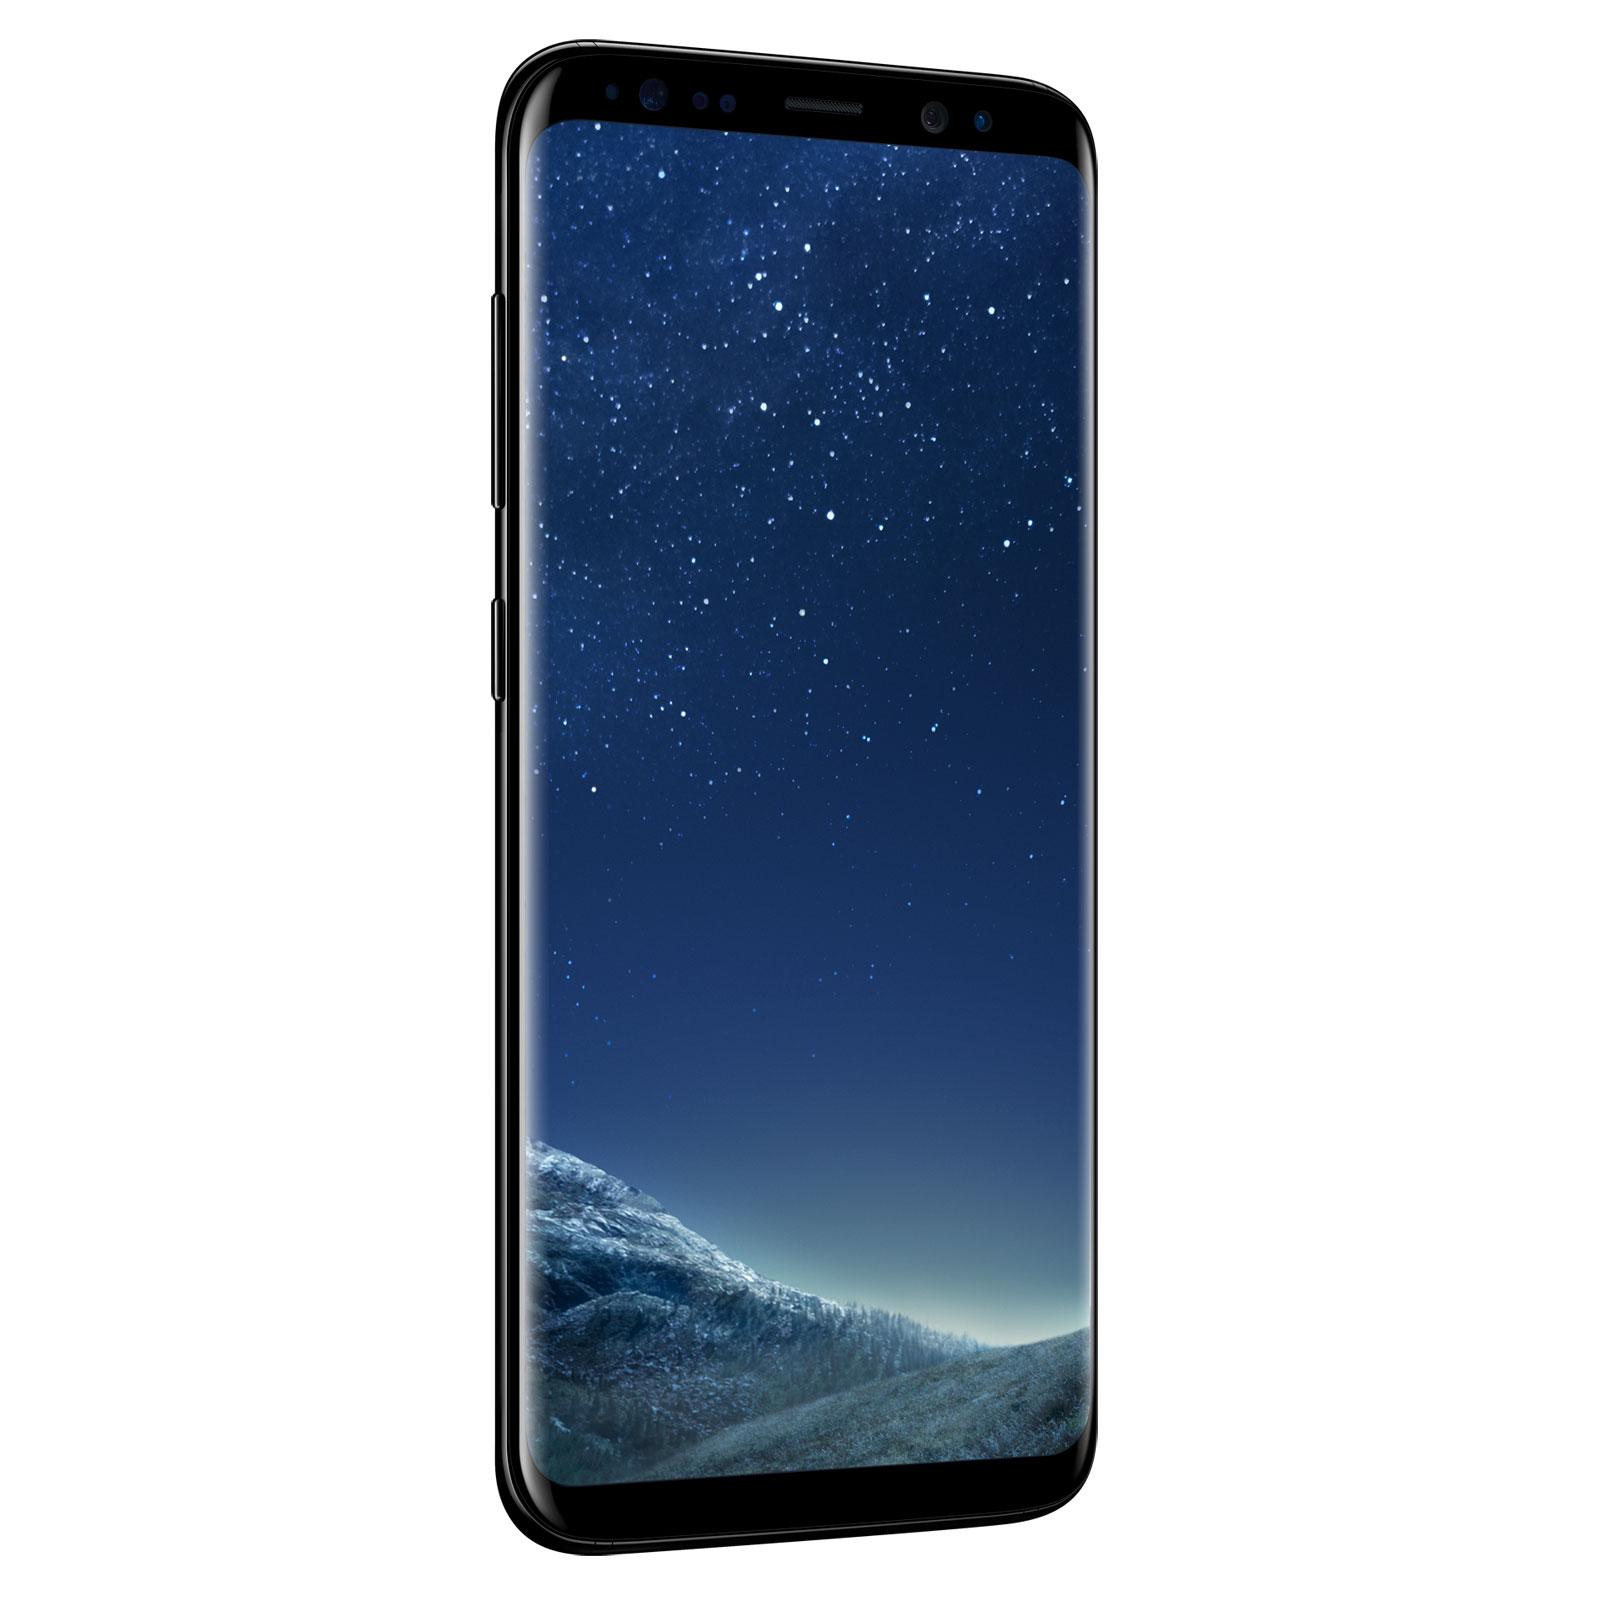 Samsung Galaxy S8 64Go G950 Black - Téléphonie Samsung - 4